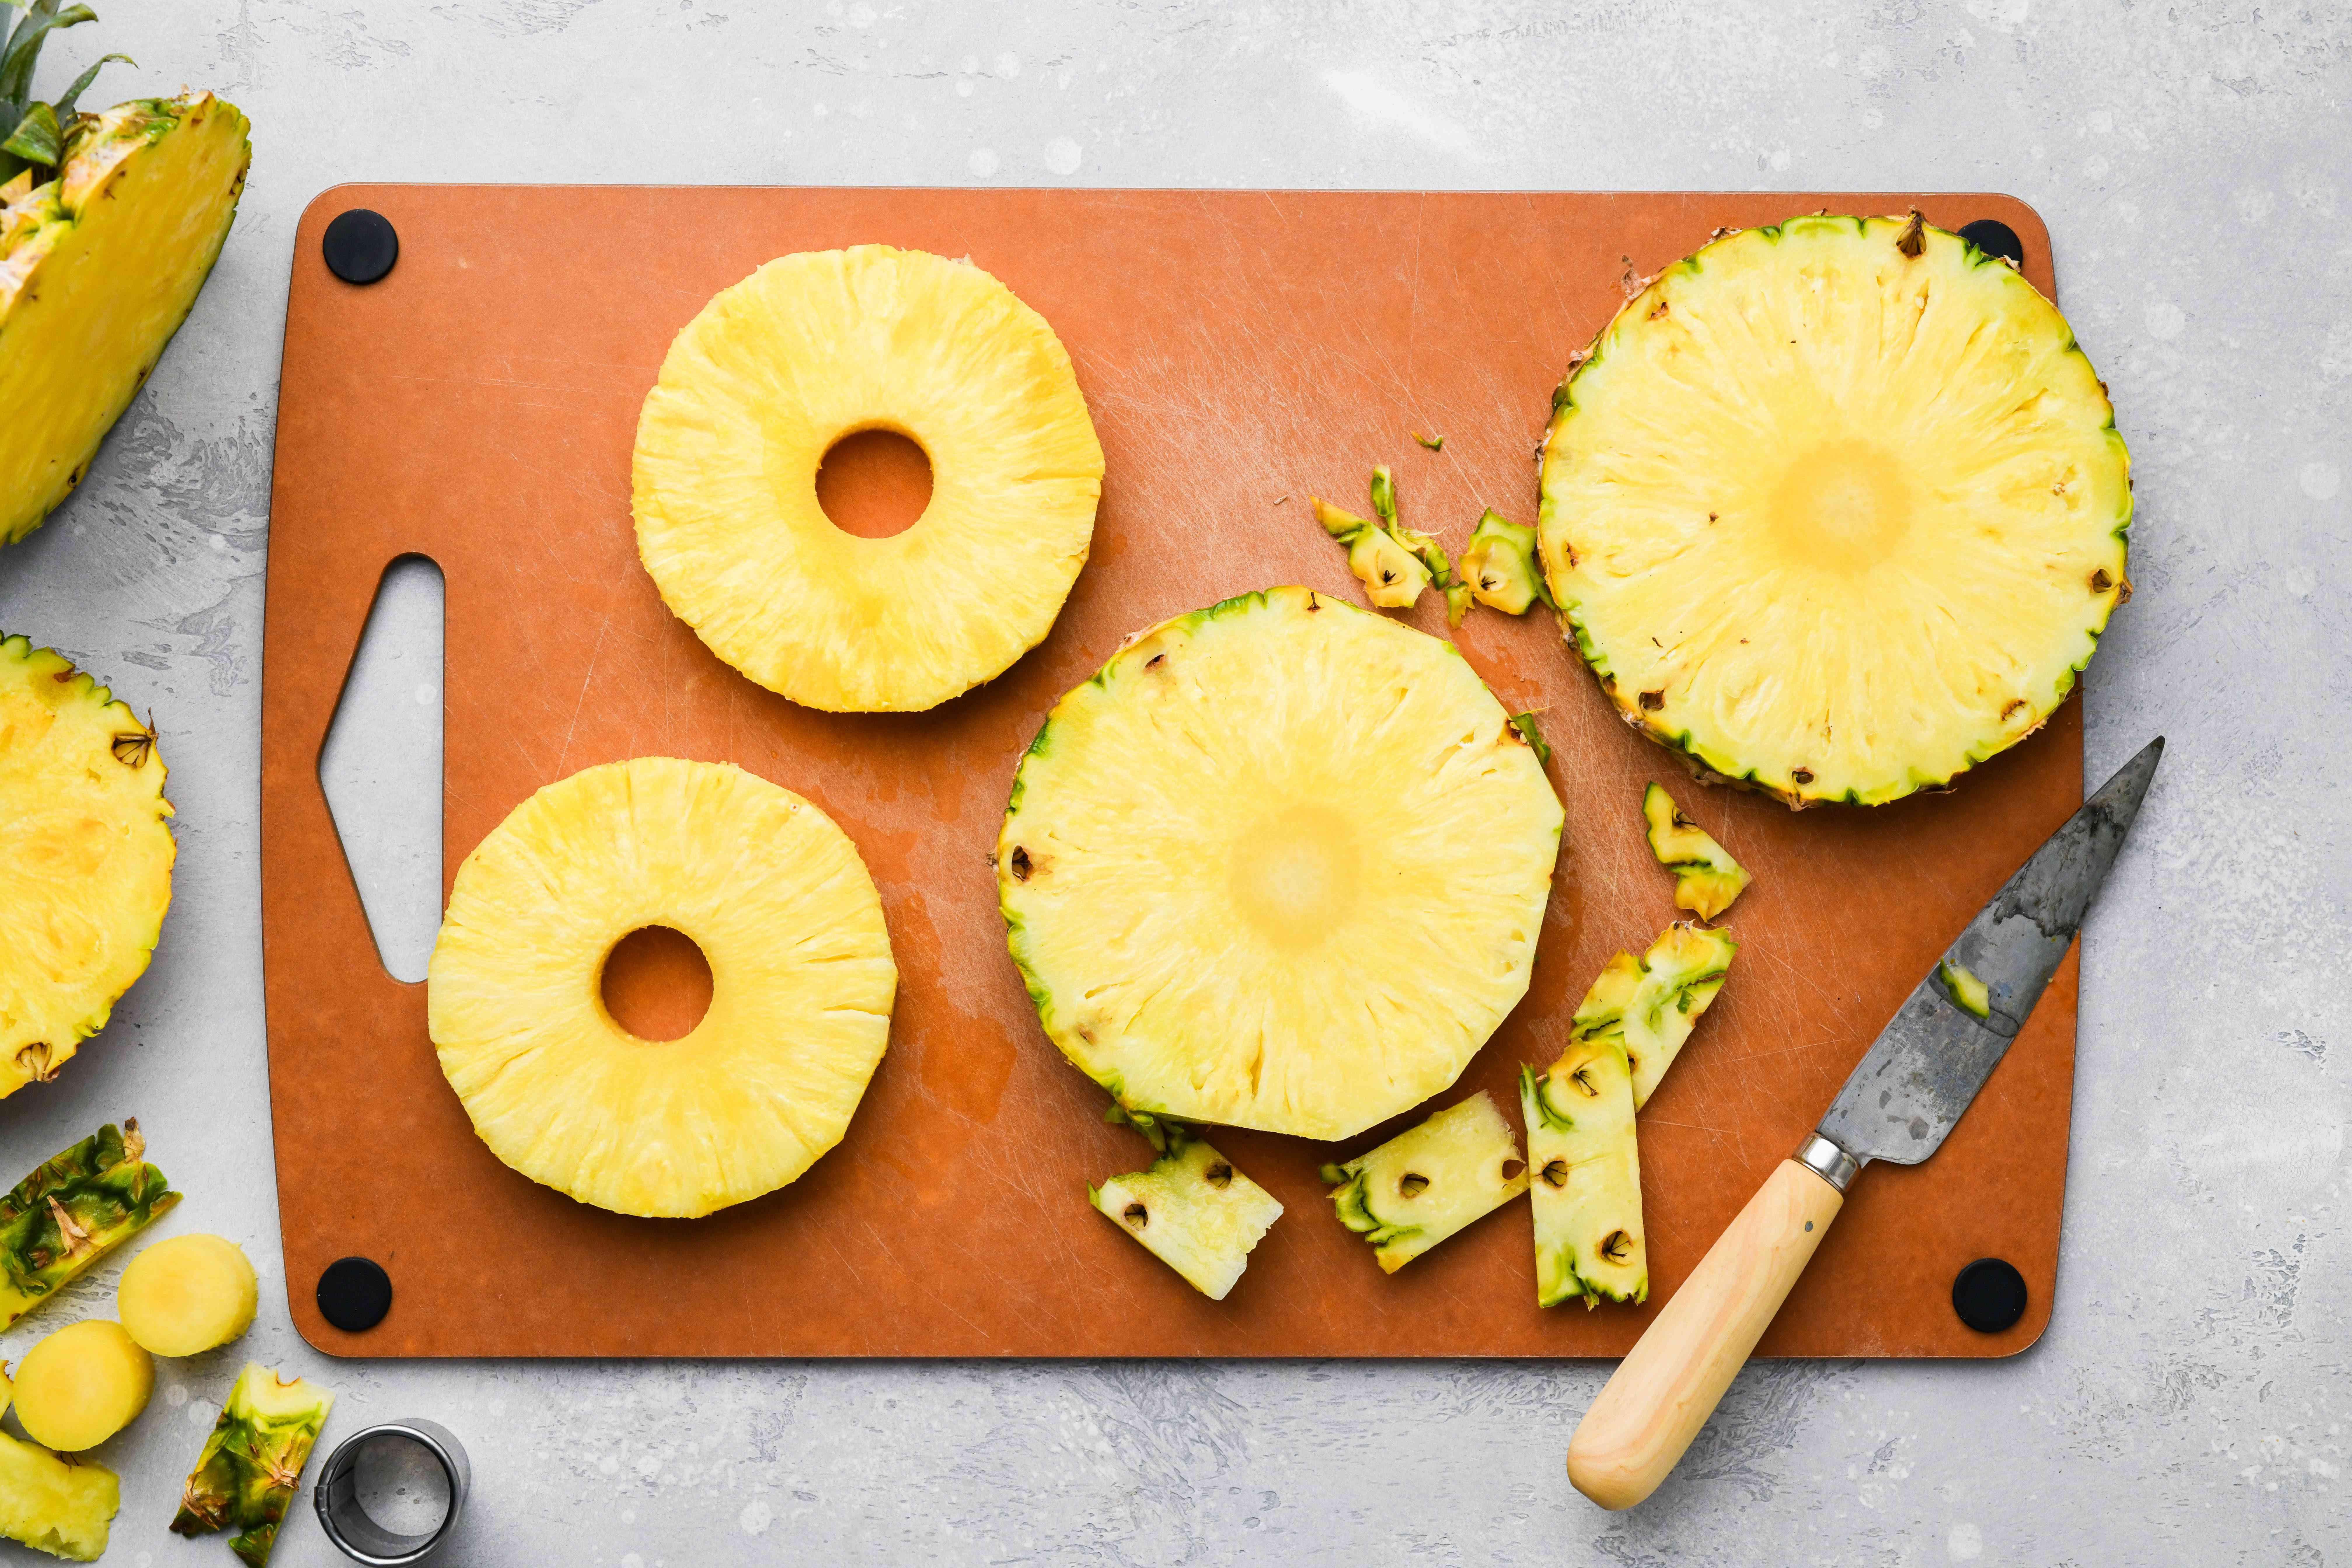 Peel, slice, and core pineapple